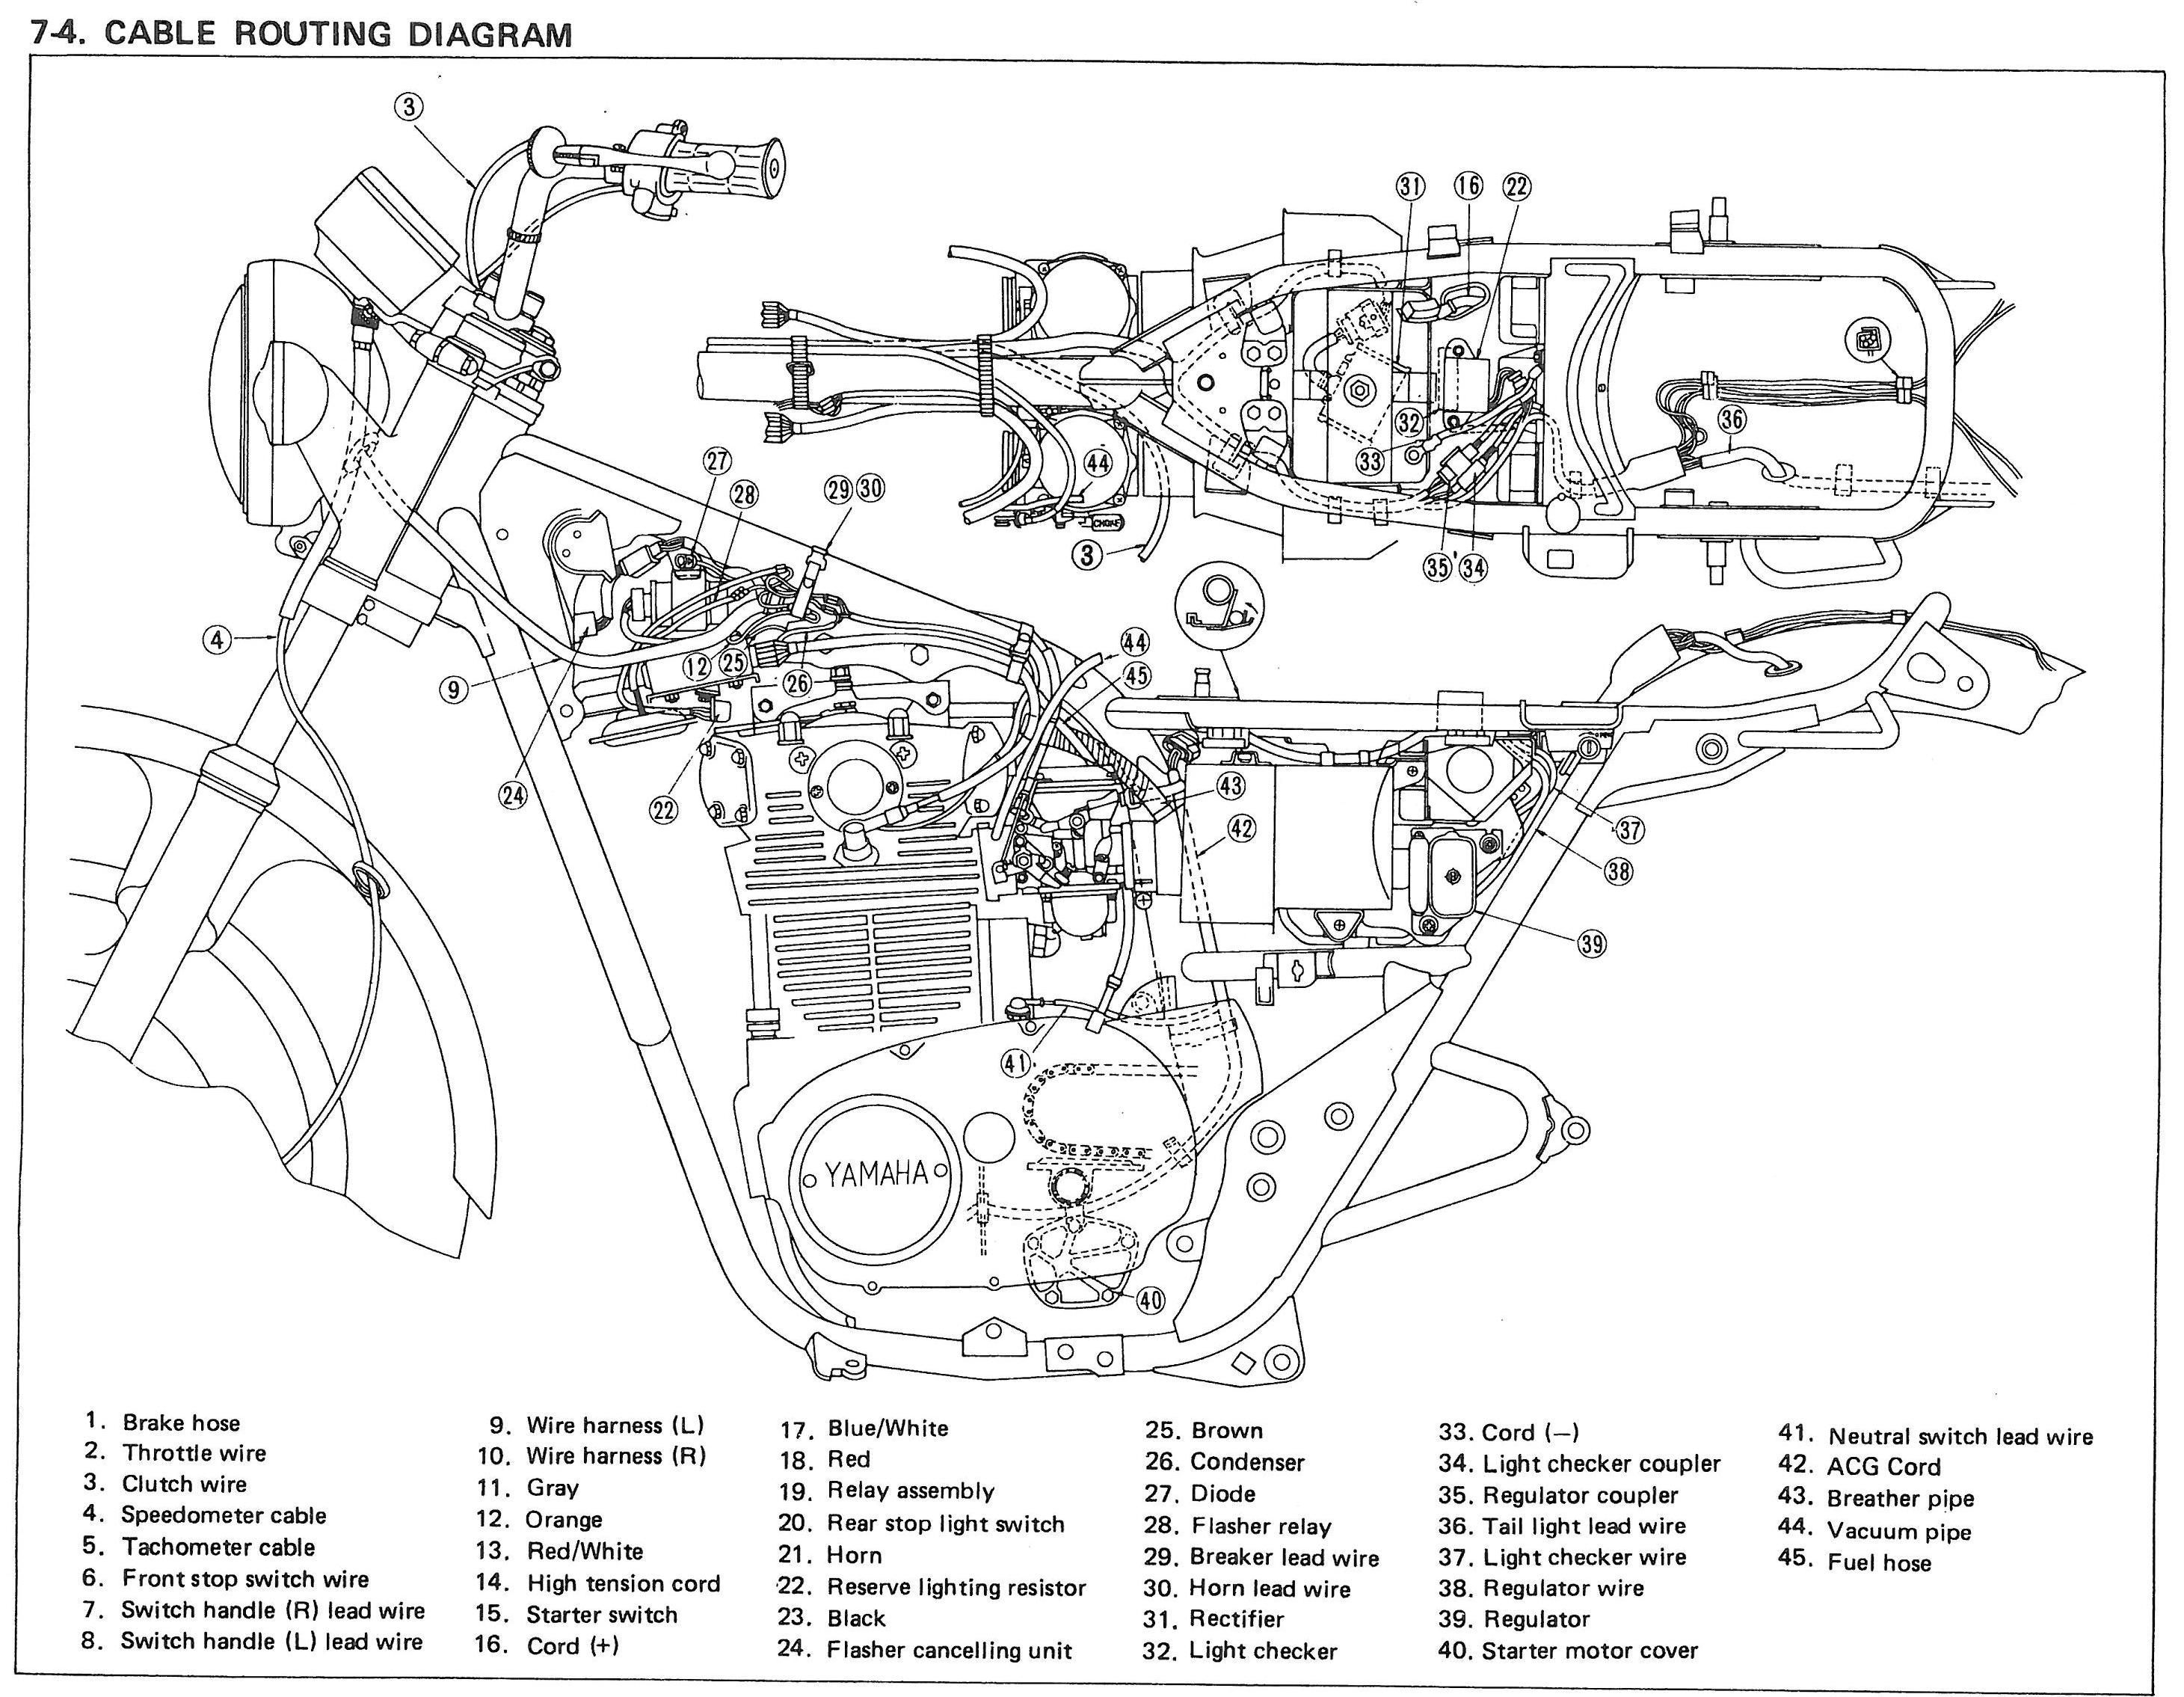 small resolution of xs650 oil diagram schematics wiring diagrams u2022 rh seniorlivinguniversity co xs650 carburetor diagram yamaha xs650 engine